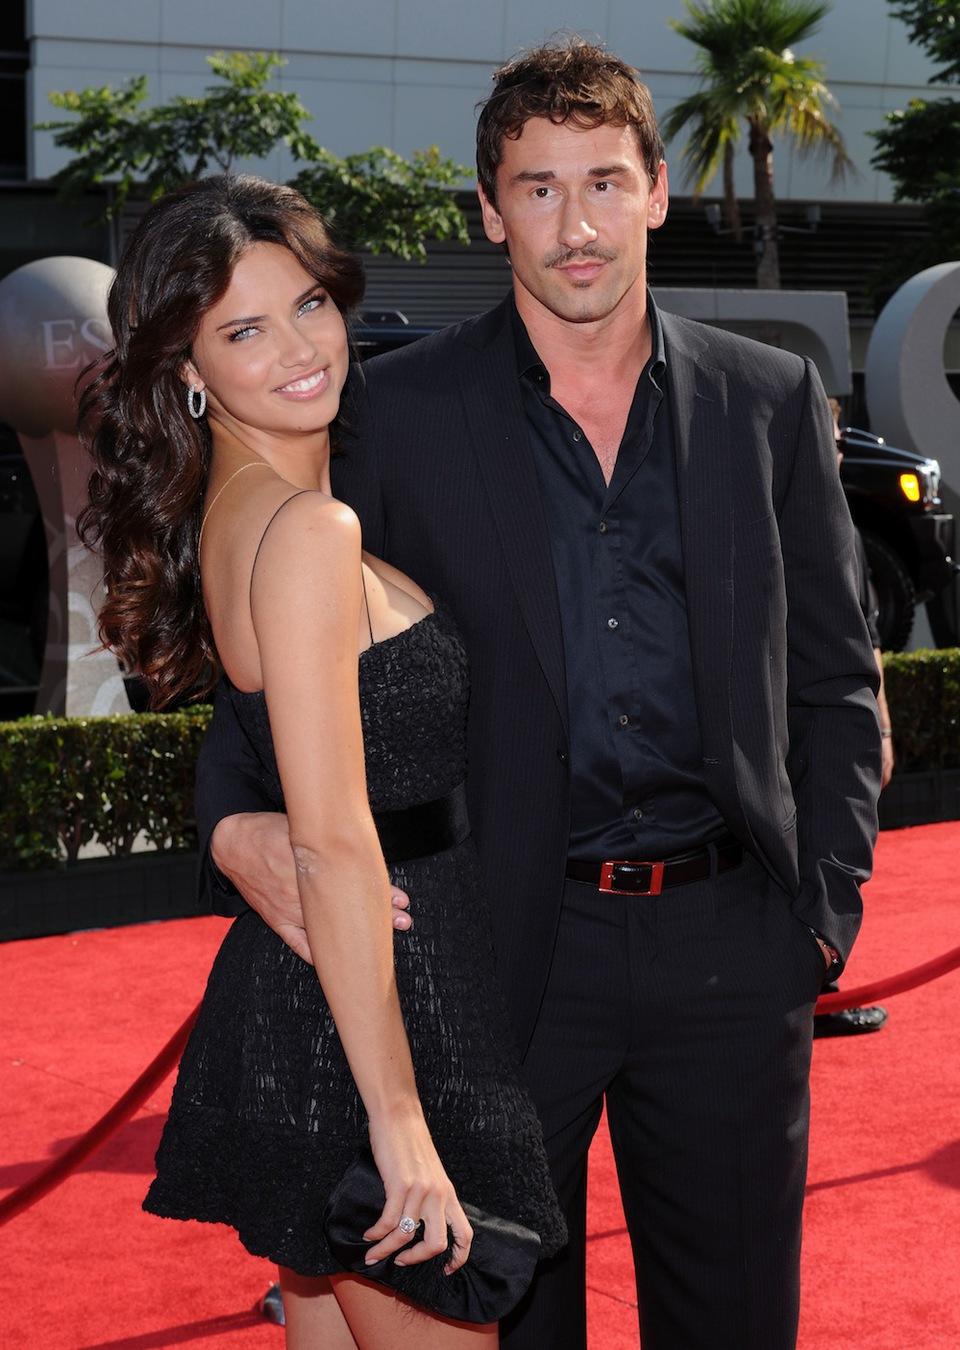 Adriana Lima With His Husband Latest Photos 2013   World